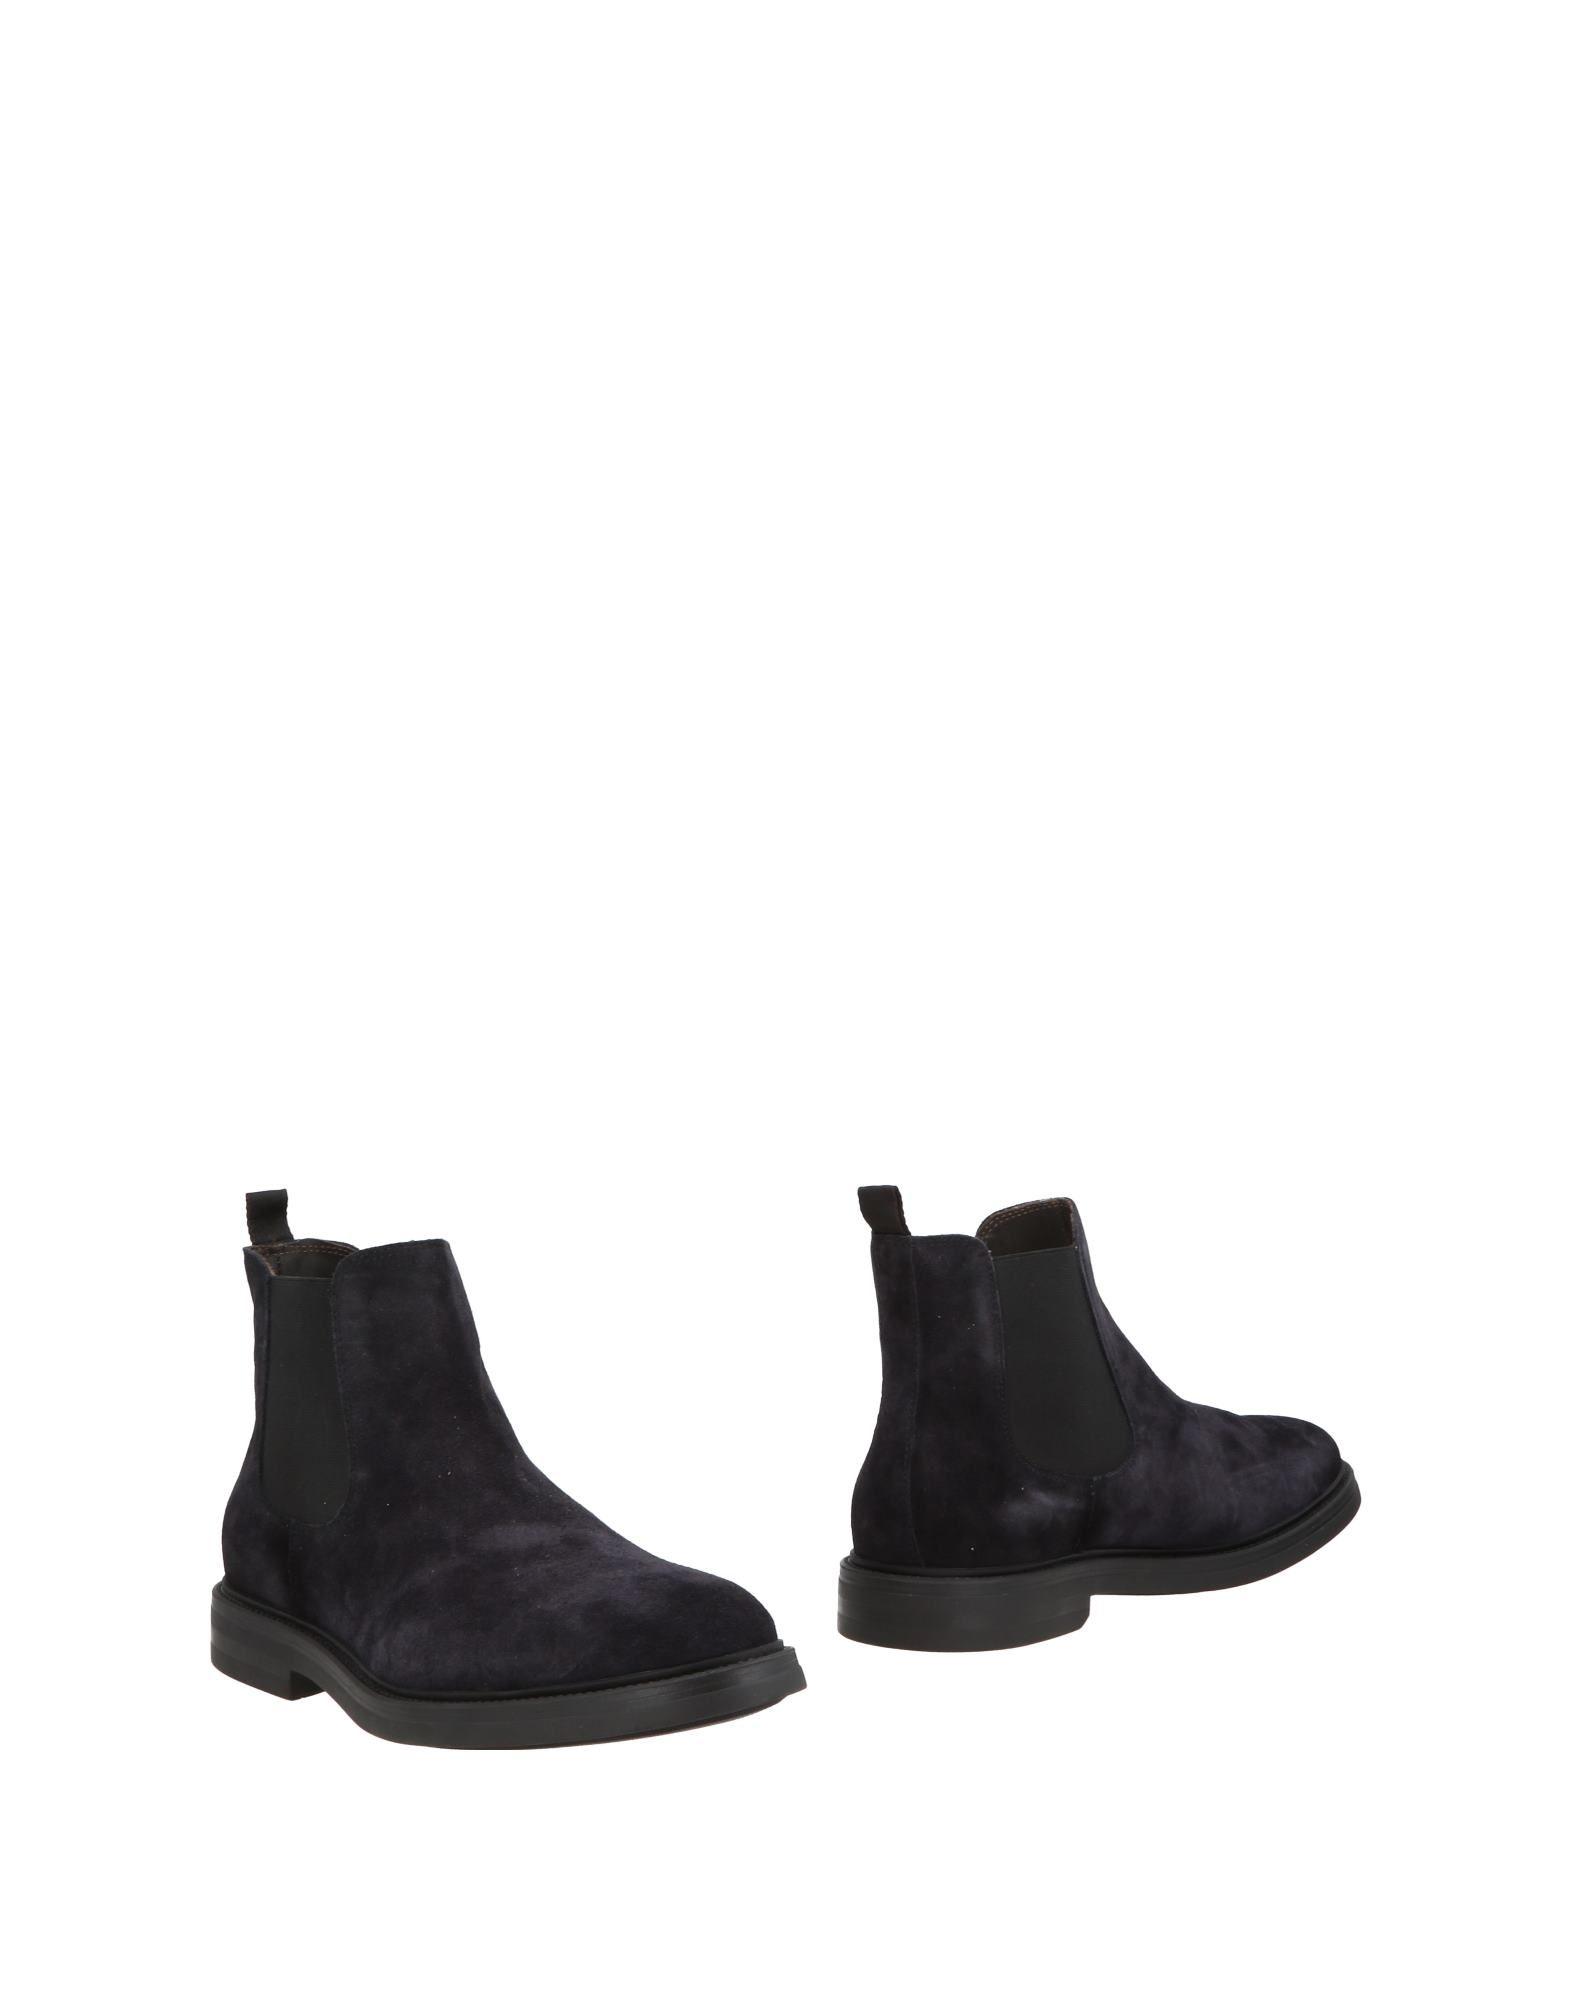 Marco Ferretti Ferretti Marco Stiefelette Herren  11499330HR Gute Qualität beliebte Schuhe d1cd13